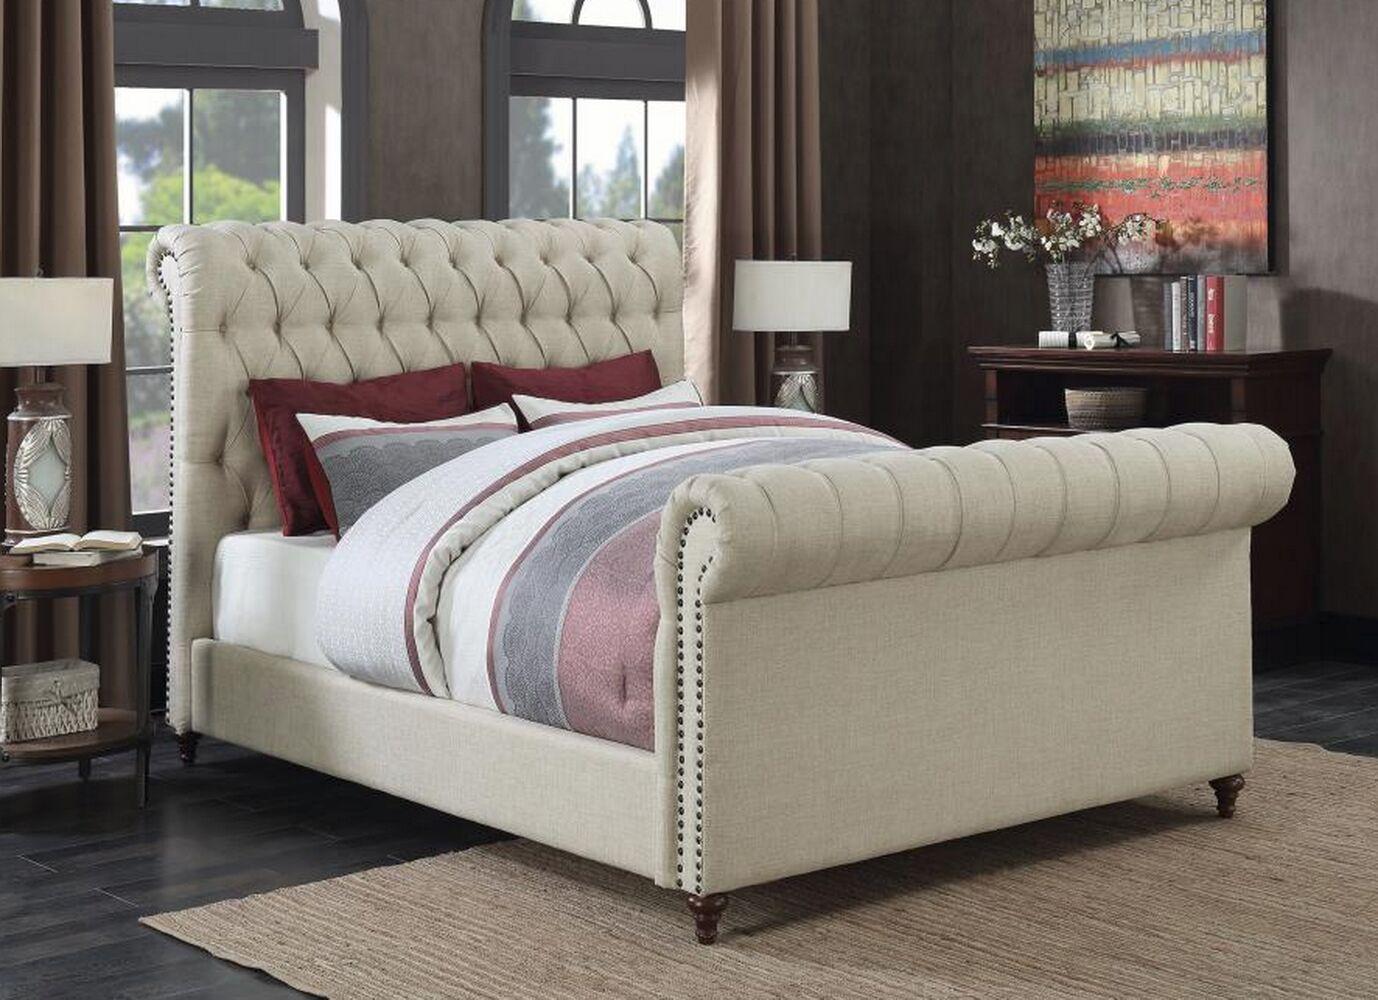 Patel Upholstered Panel Bed Color: Beige, Size: California King